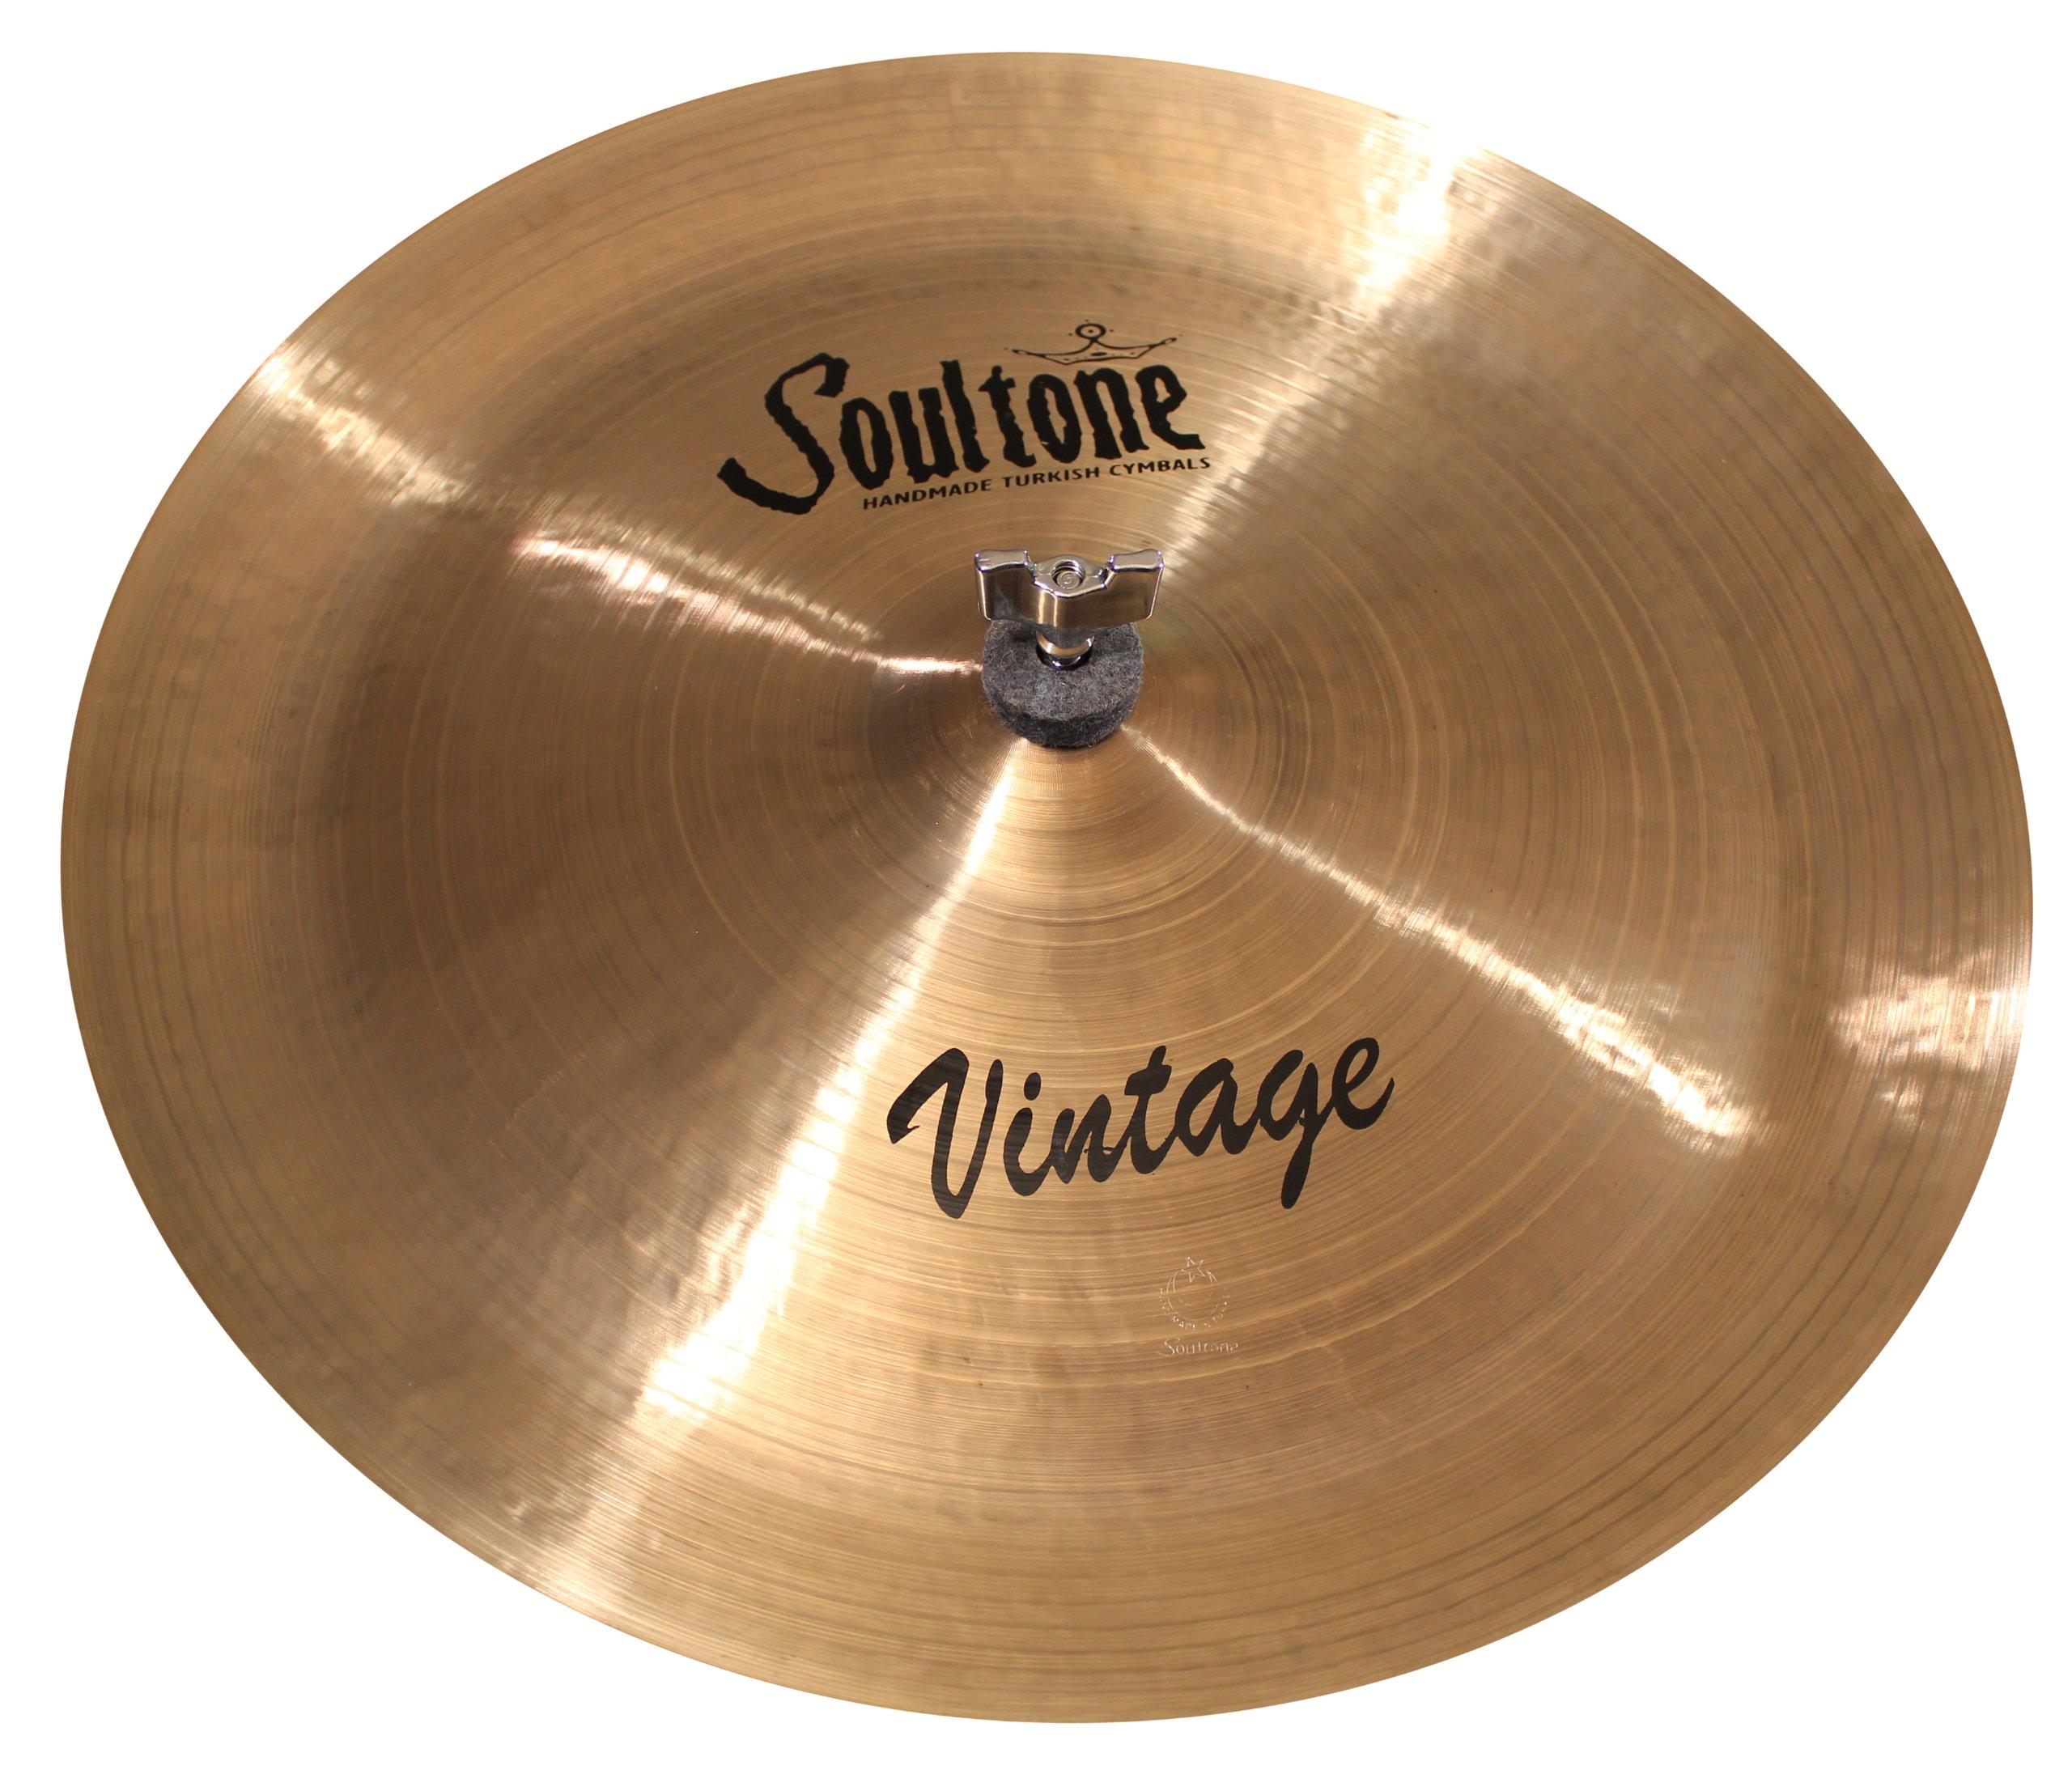 Soultone Cymbals VNT-CHN21-21'' Vintage China